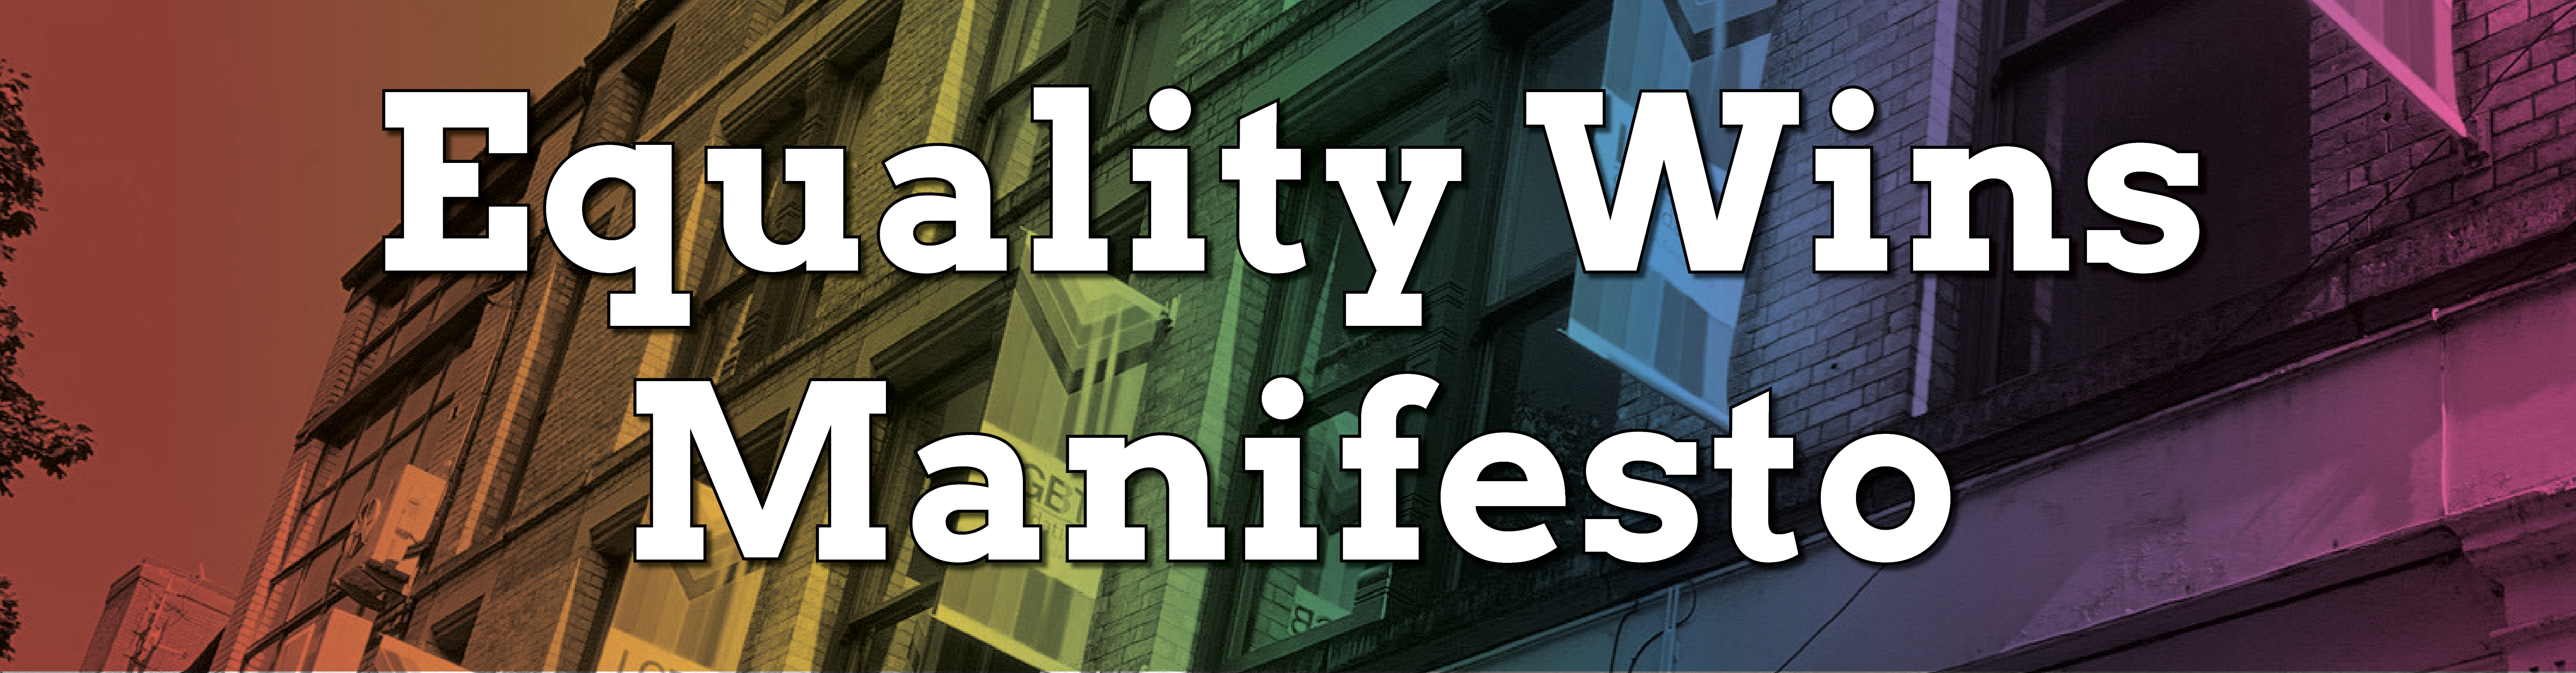 equality wins manifesto